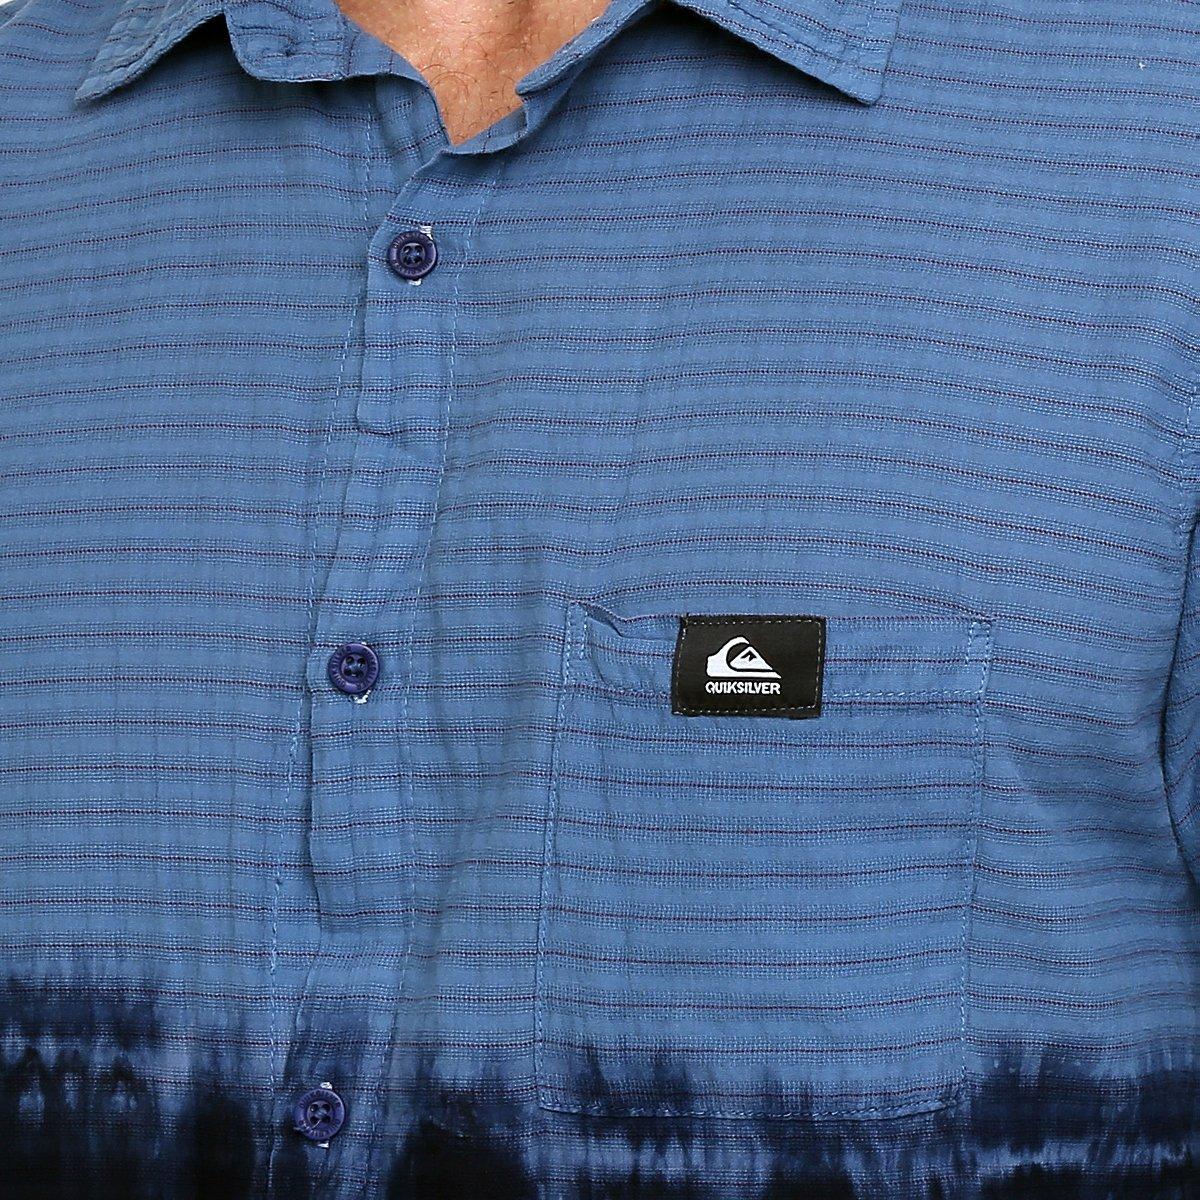 3771d04bdb061 Camisa Quiksilver Malibu Camisa Quiksilver Malibu a7555101987f8 ...